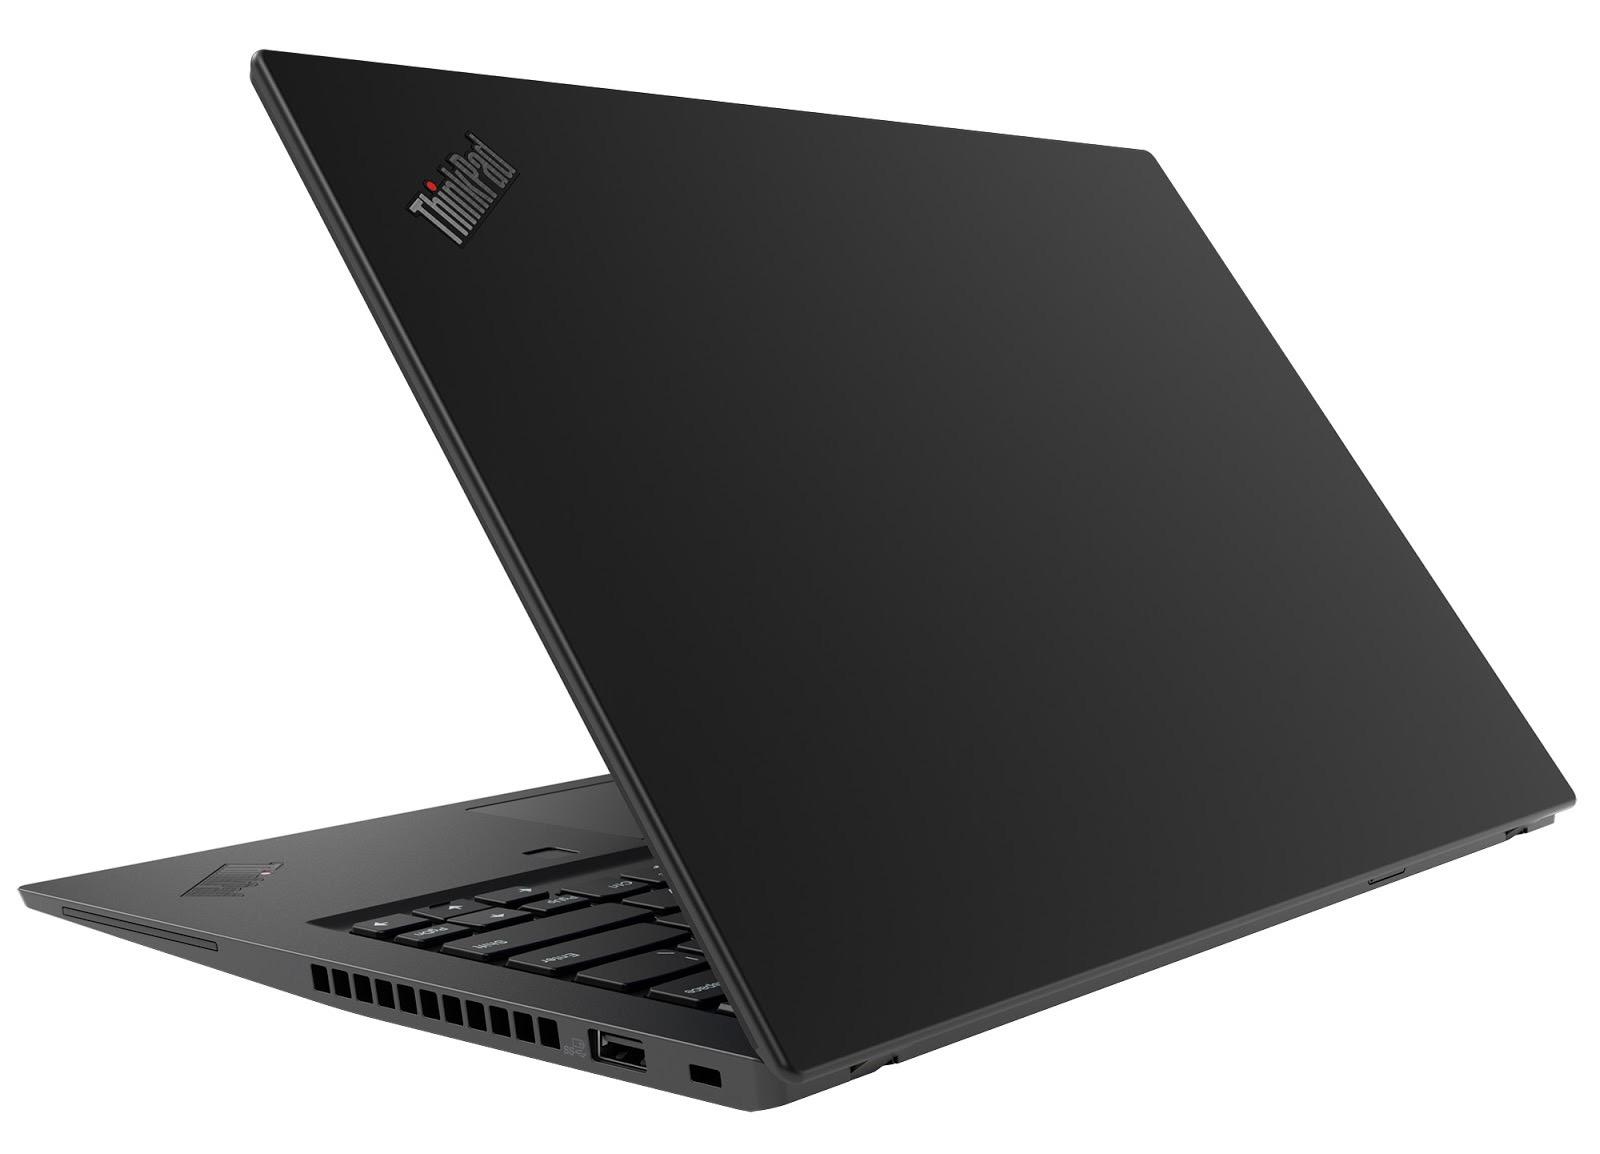 Фото 2. Ноутбук Lenovo ThinkPad T14s Gen 1 Black (20T0001ERT)